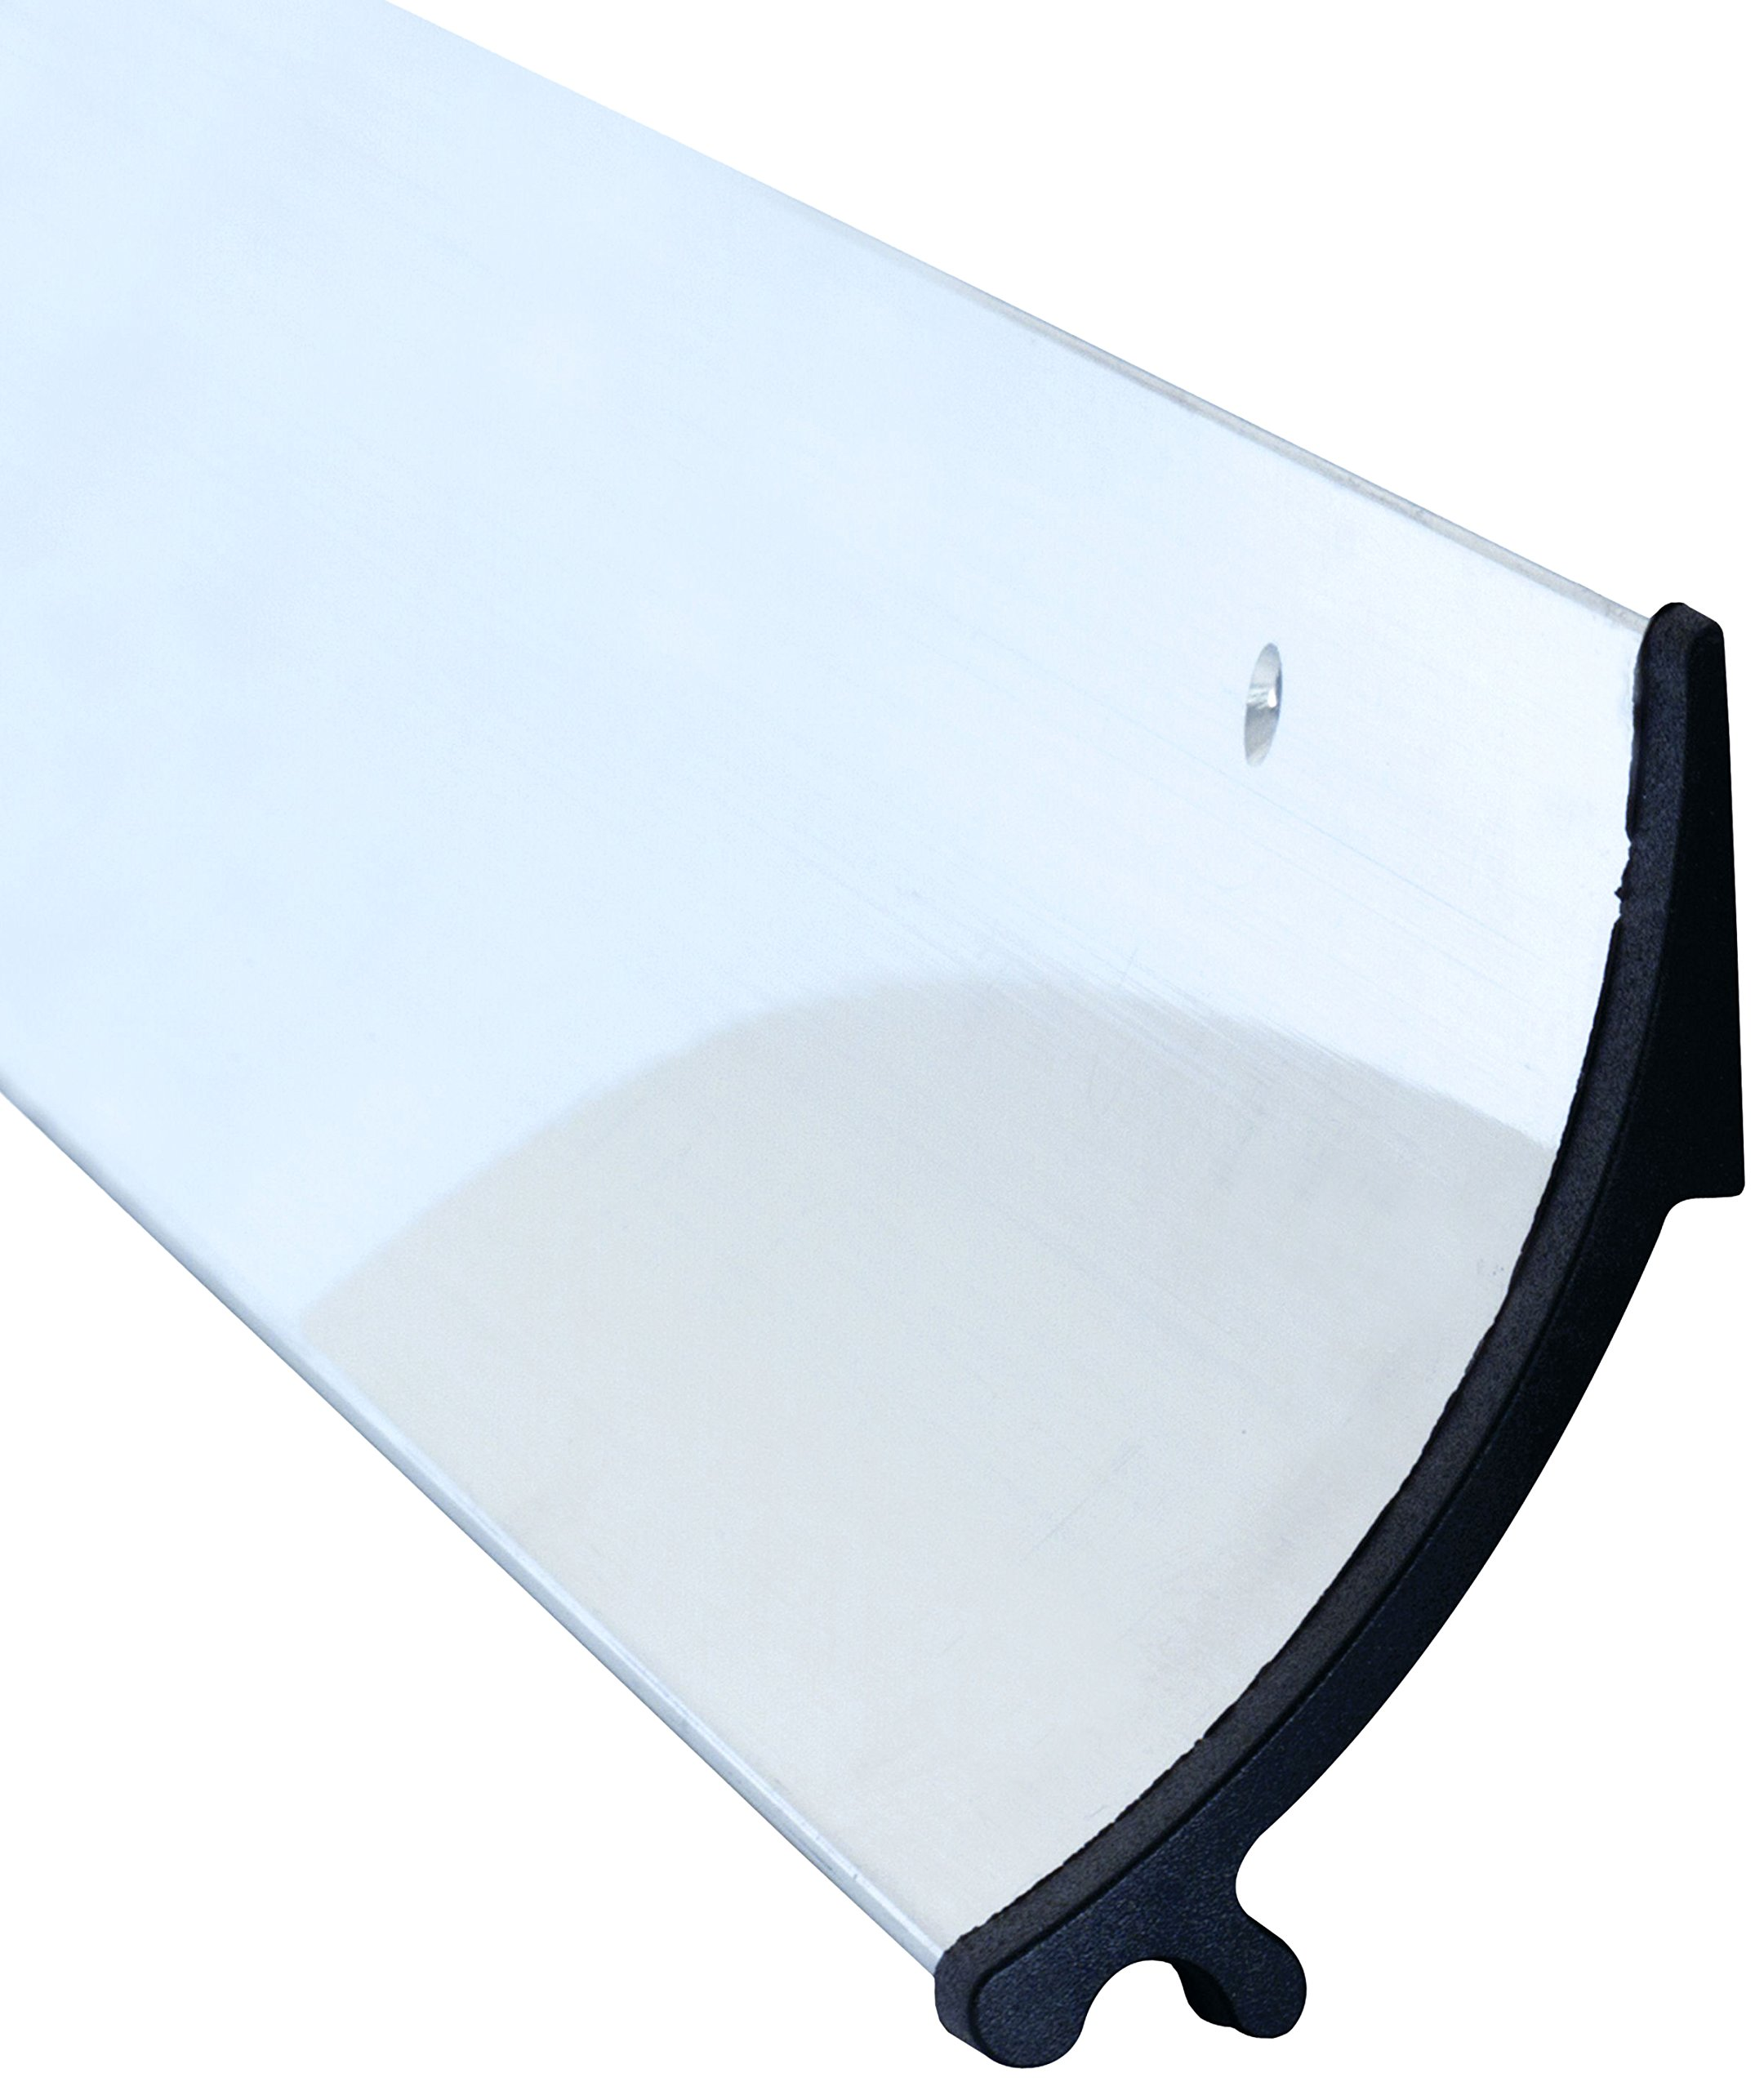 STORMGUARD 07SR0140838A SRD 63-838 mm Rain Deflector Weather Drip Bar - Aluminium